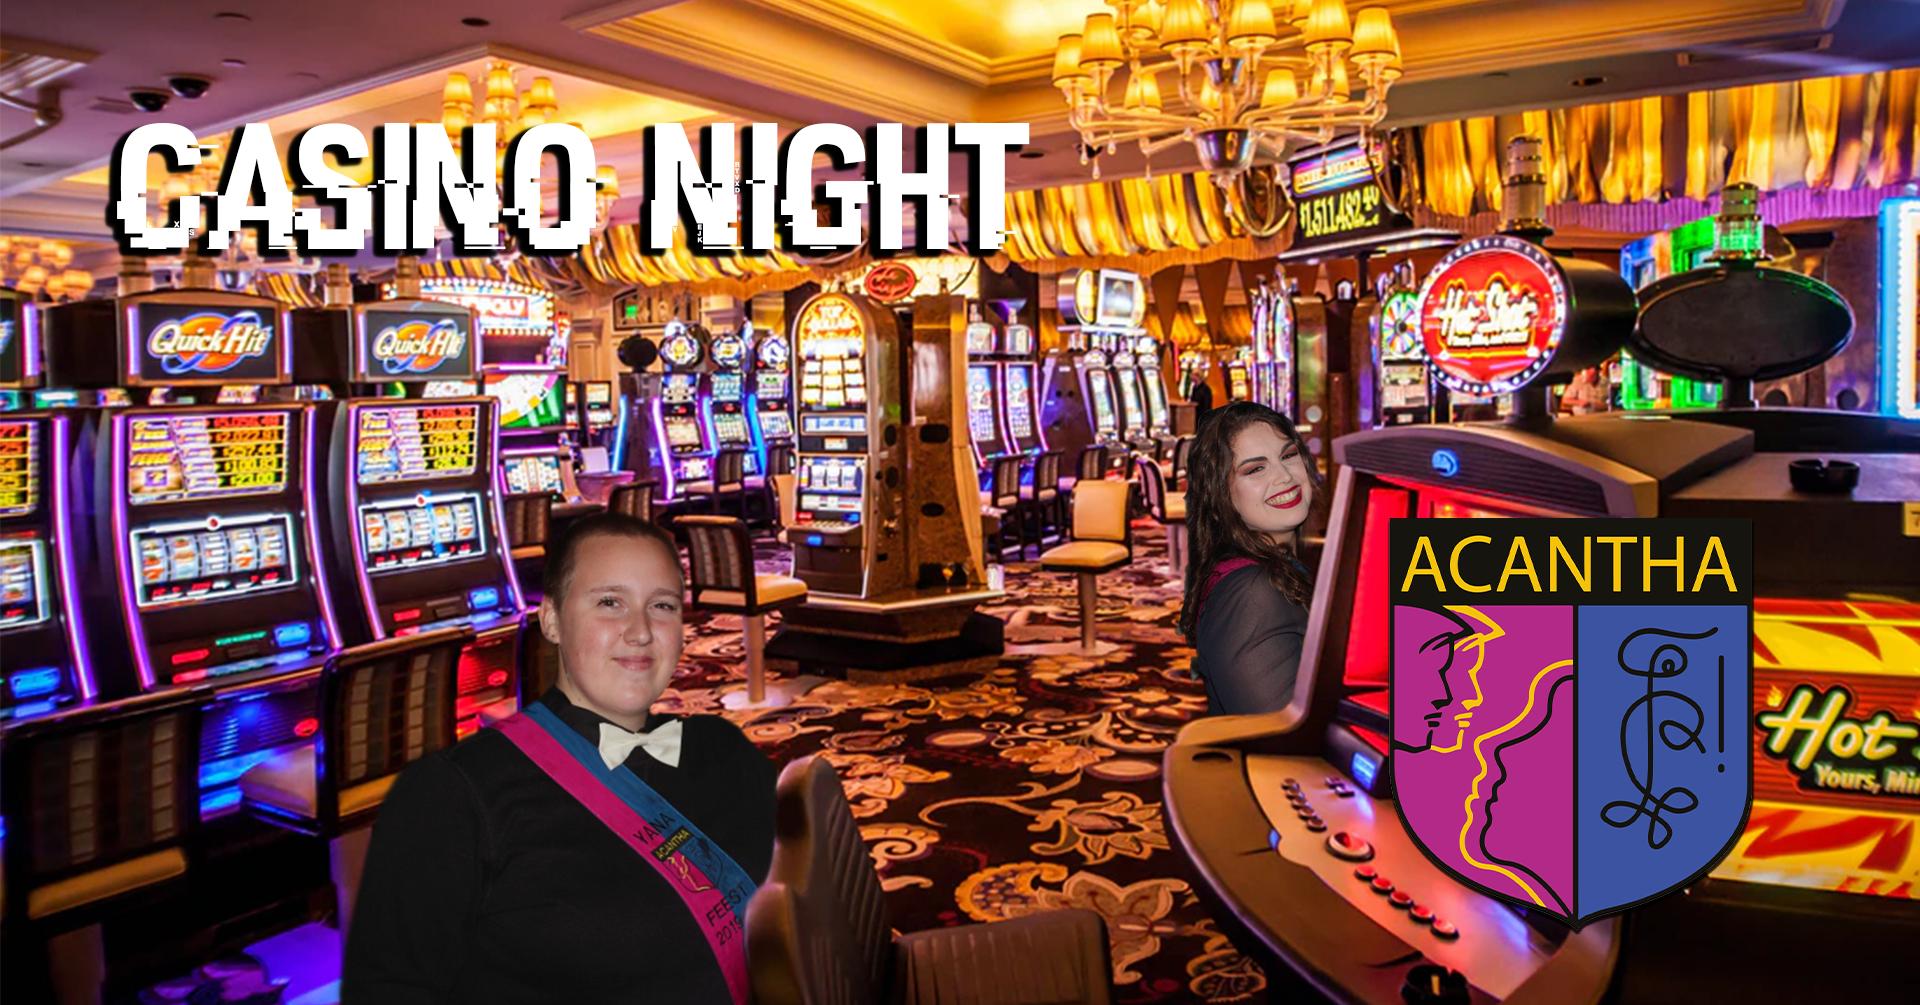 Acantha Casino Night Gala Edition